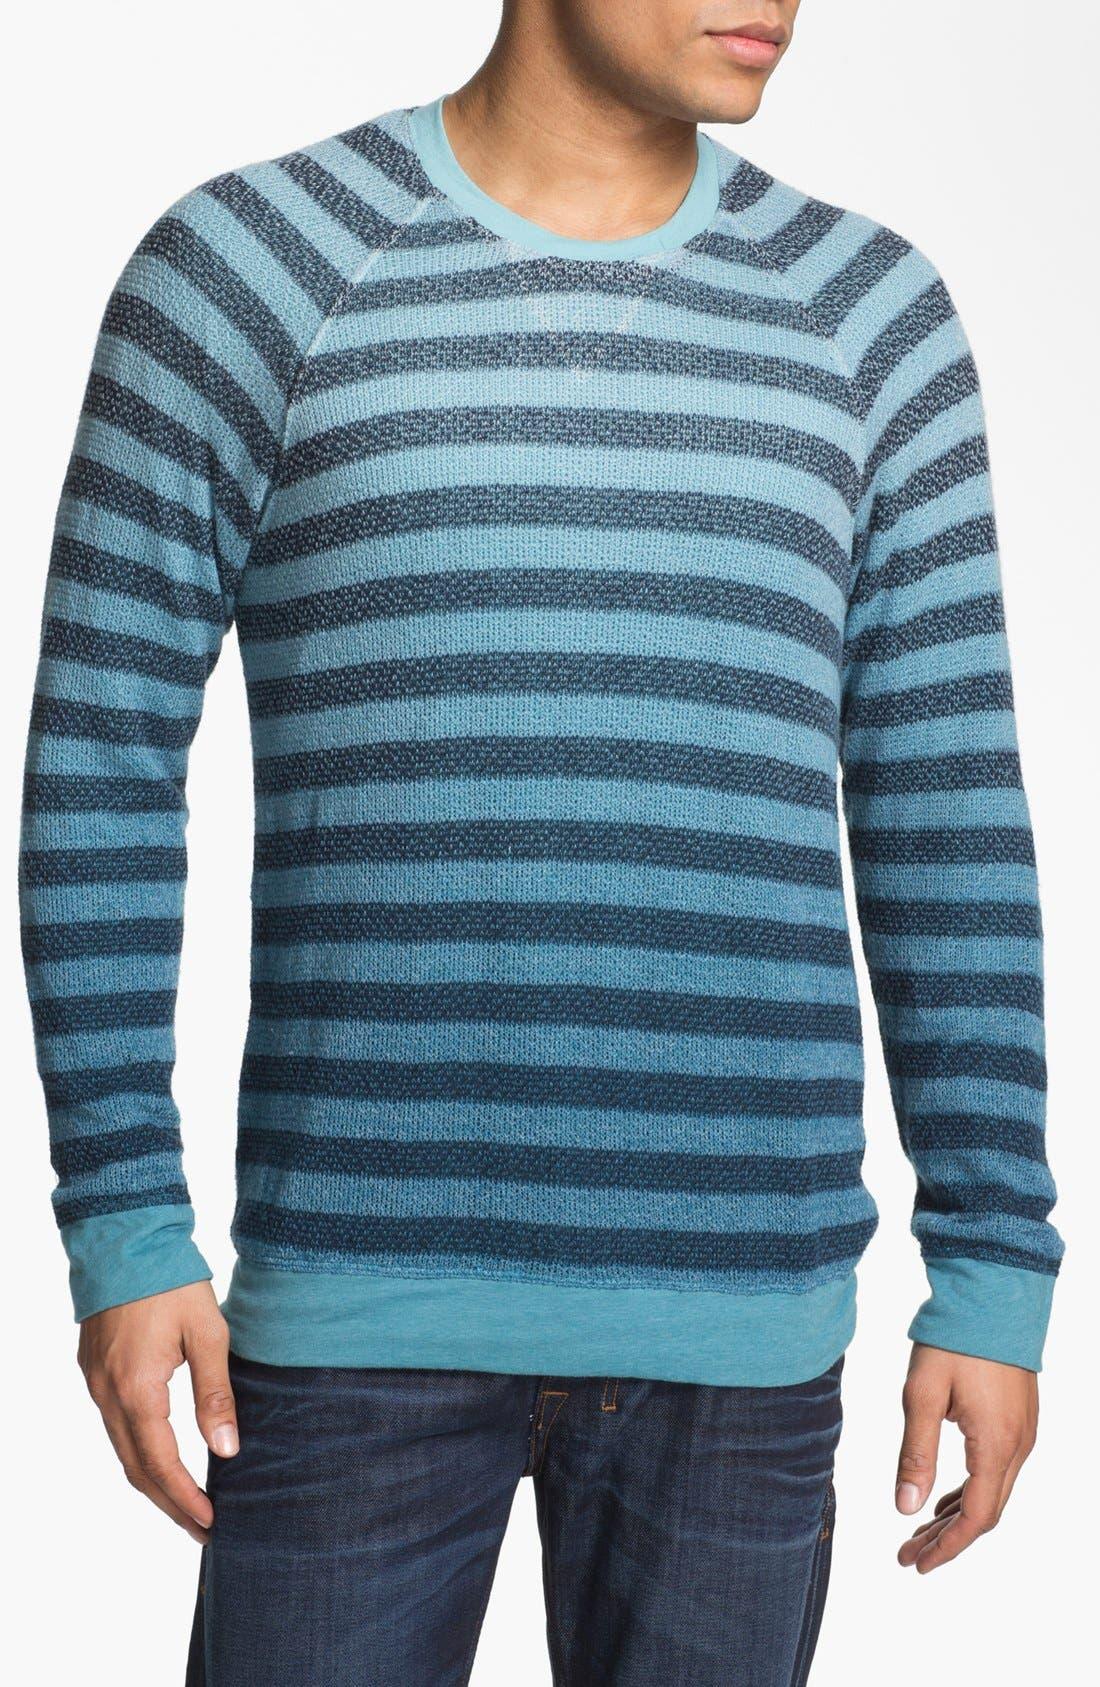 Alternate Image 1 Selected - Gypsy 05 Reversible Crewneck Sweater